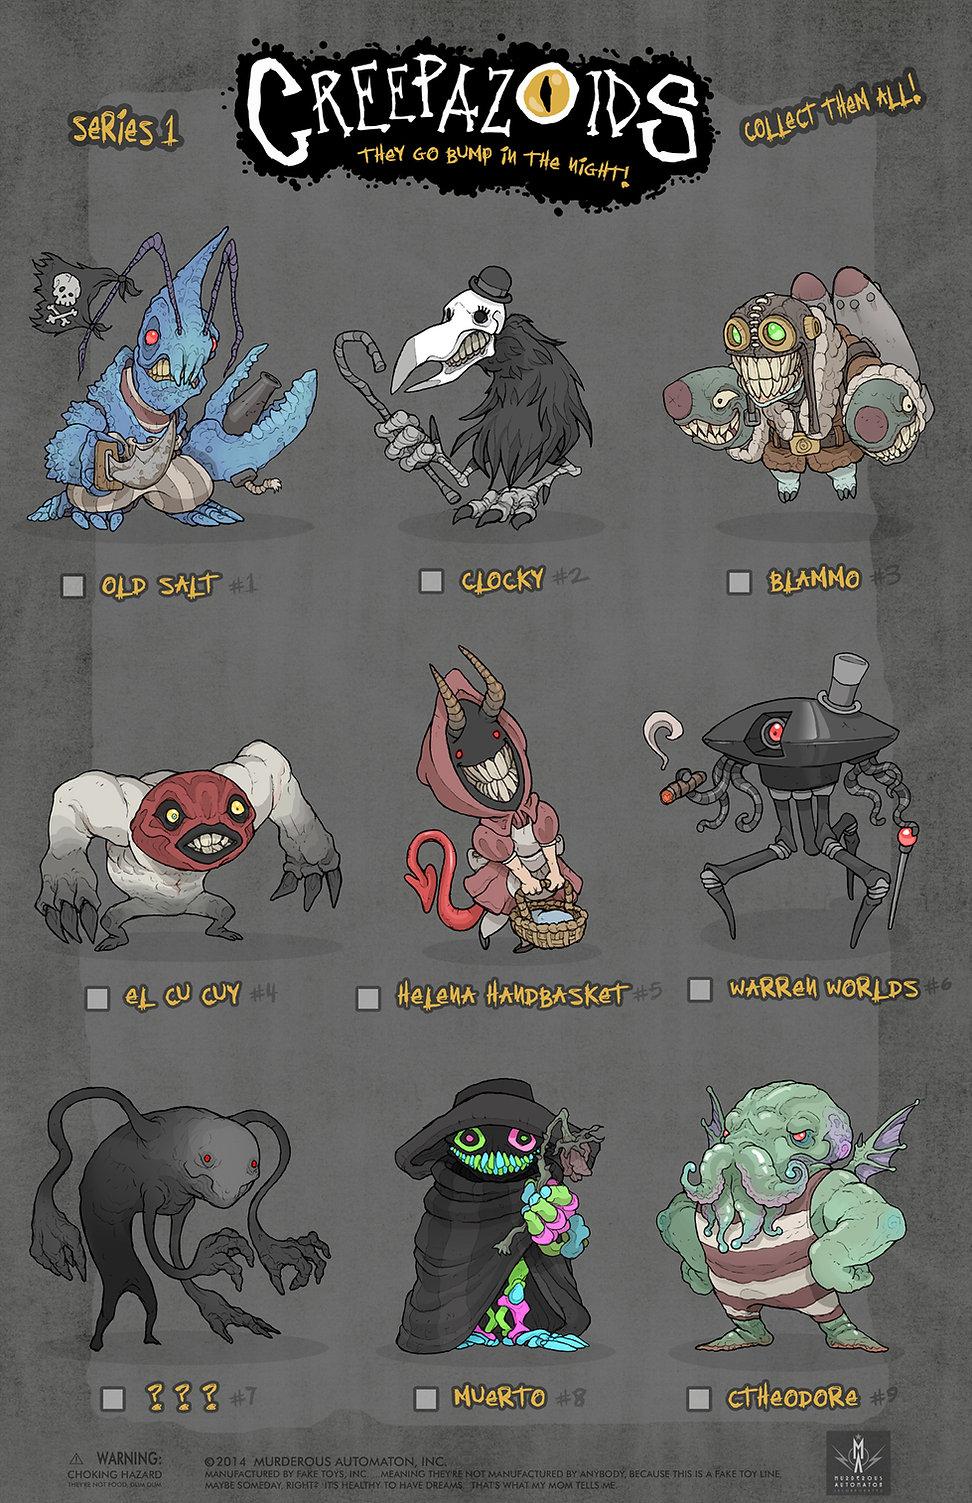 Creepazoids (Series 1).jpg